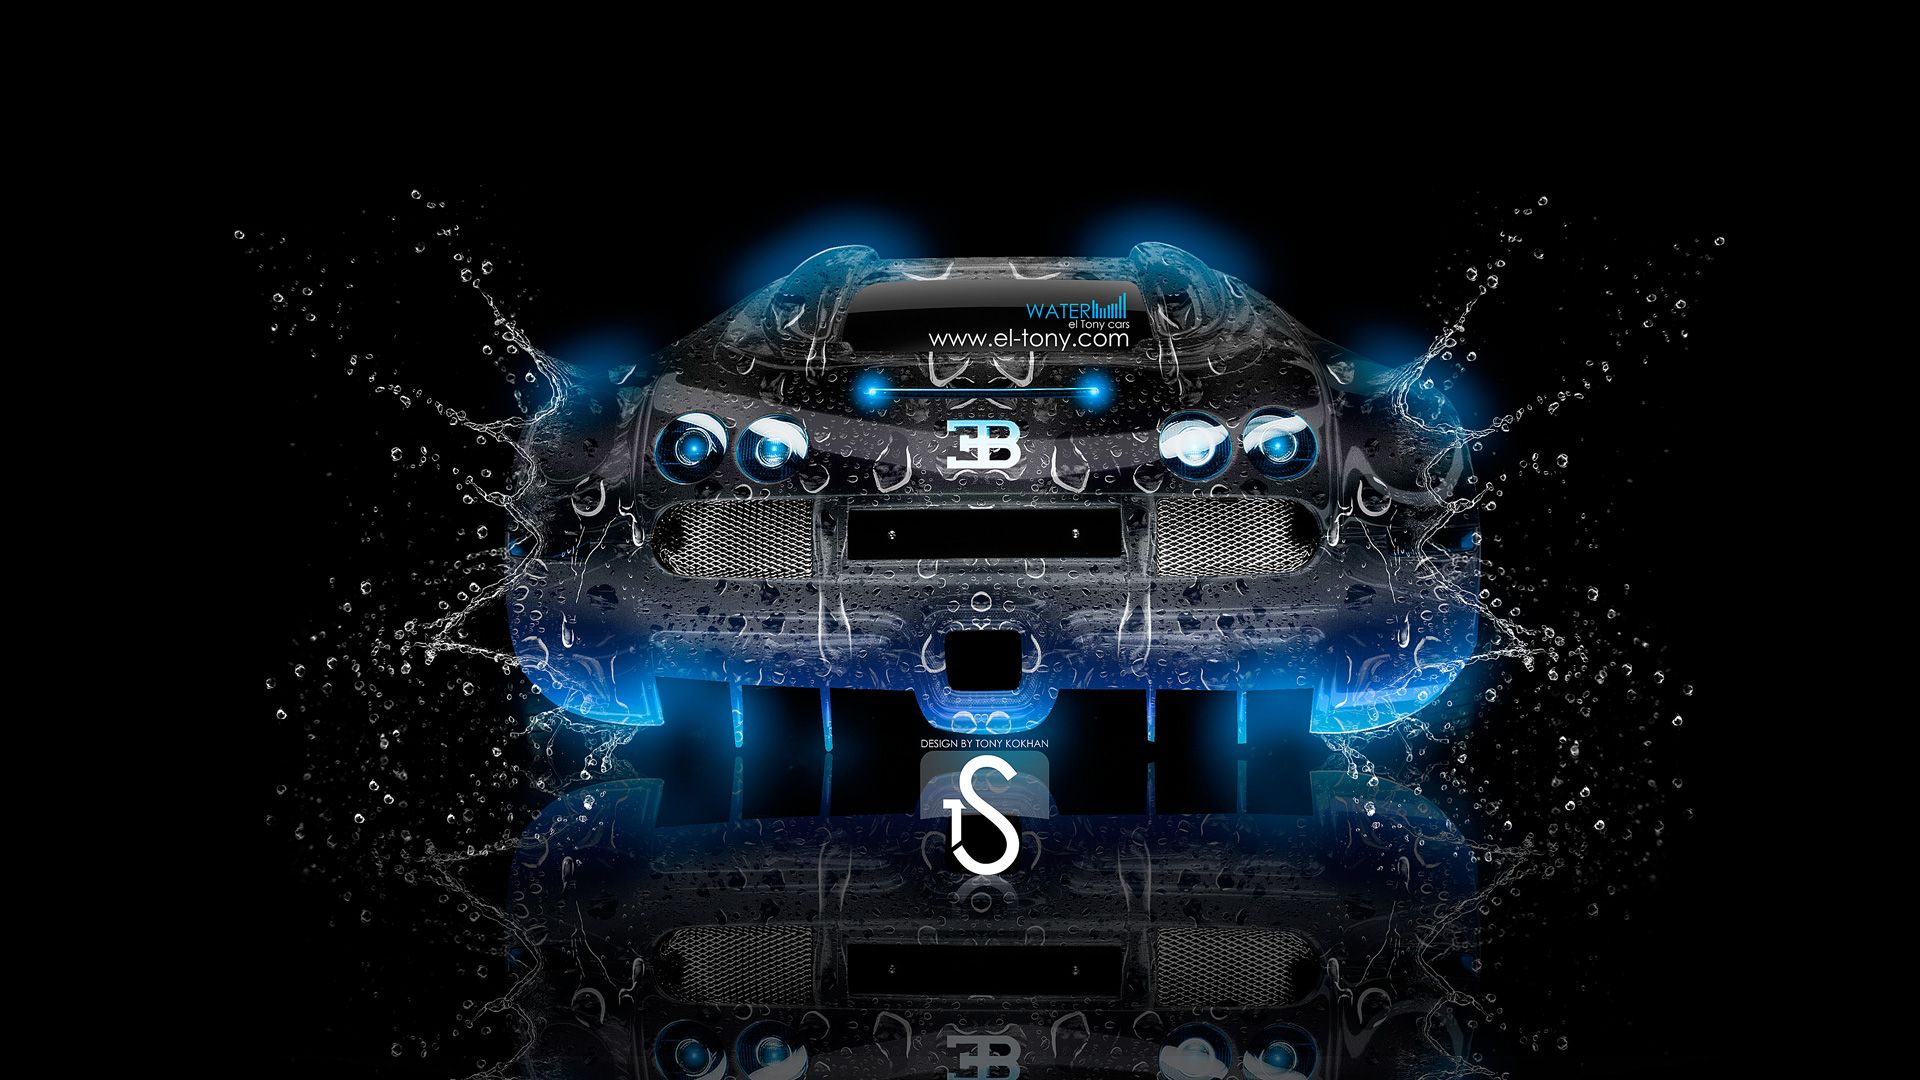 Bugatti Veyron Water Car  2013 Back Blue Neon Hd Wallpapers By Tony Kokhan Www El Tony Com_